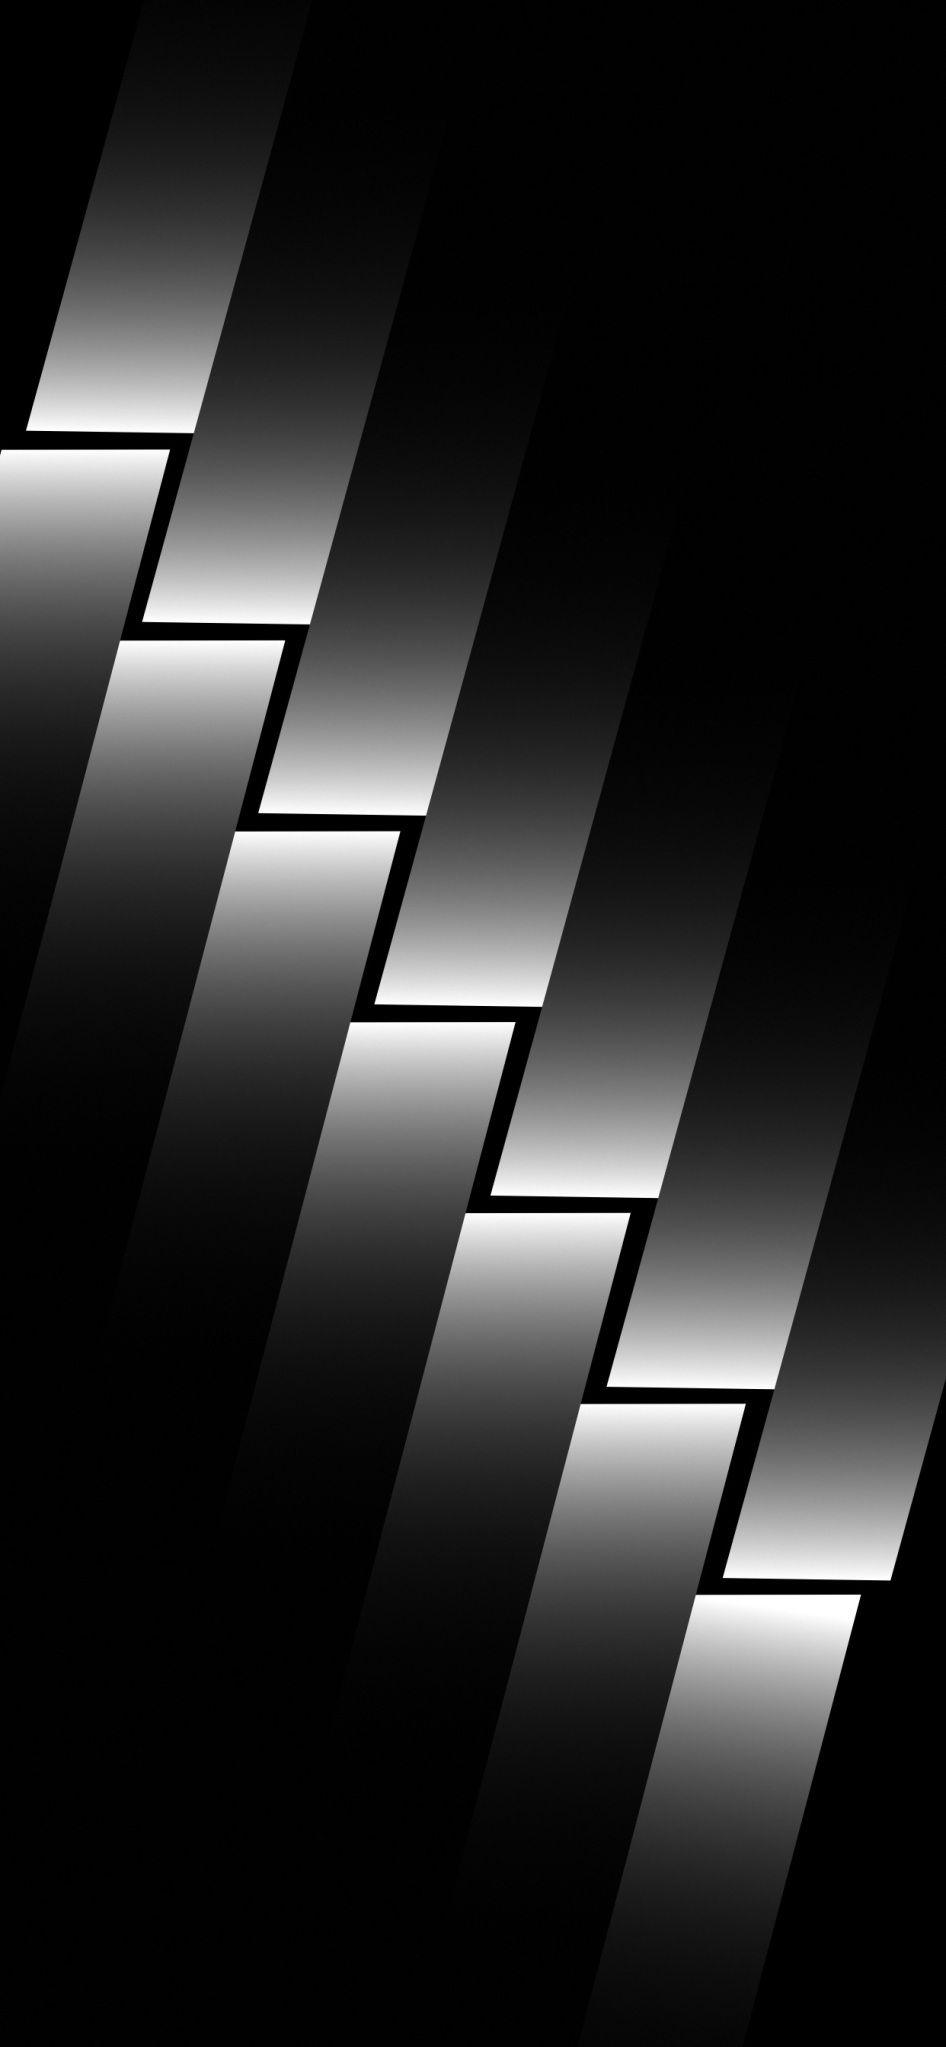 Hotspot4u Art Graphic Wallpapers Designer Original Iphone Wallpaper Graphic Wallpaper Dark Black Wallpaper